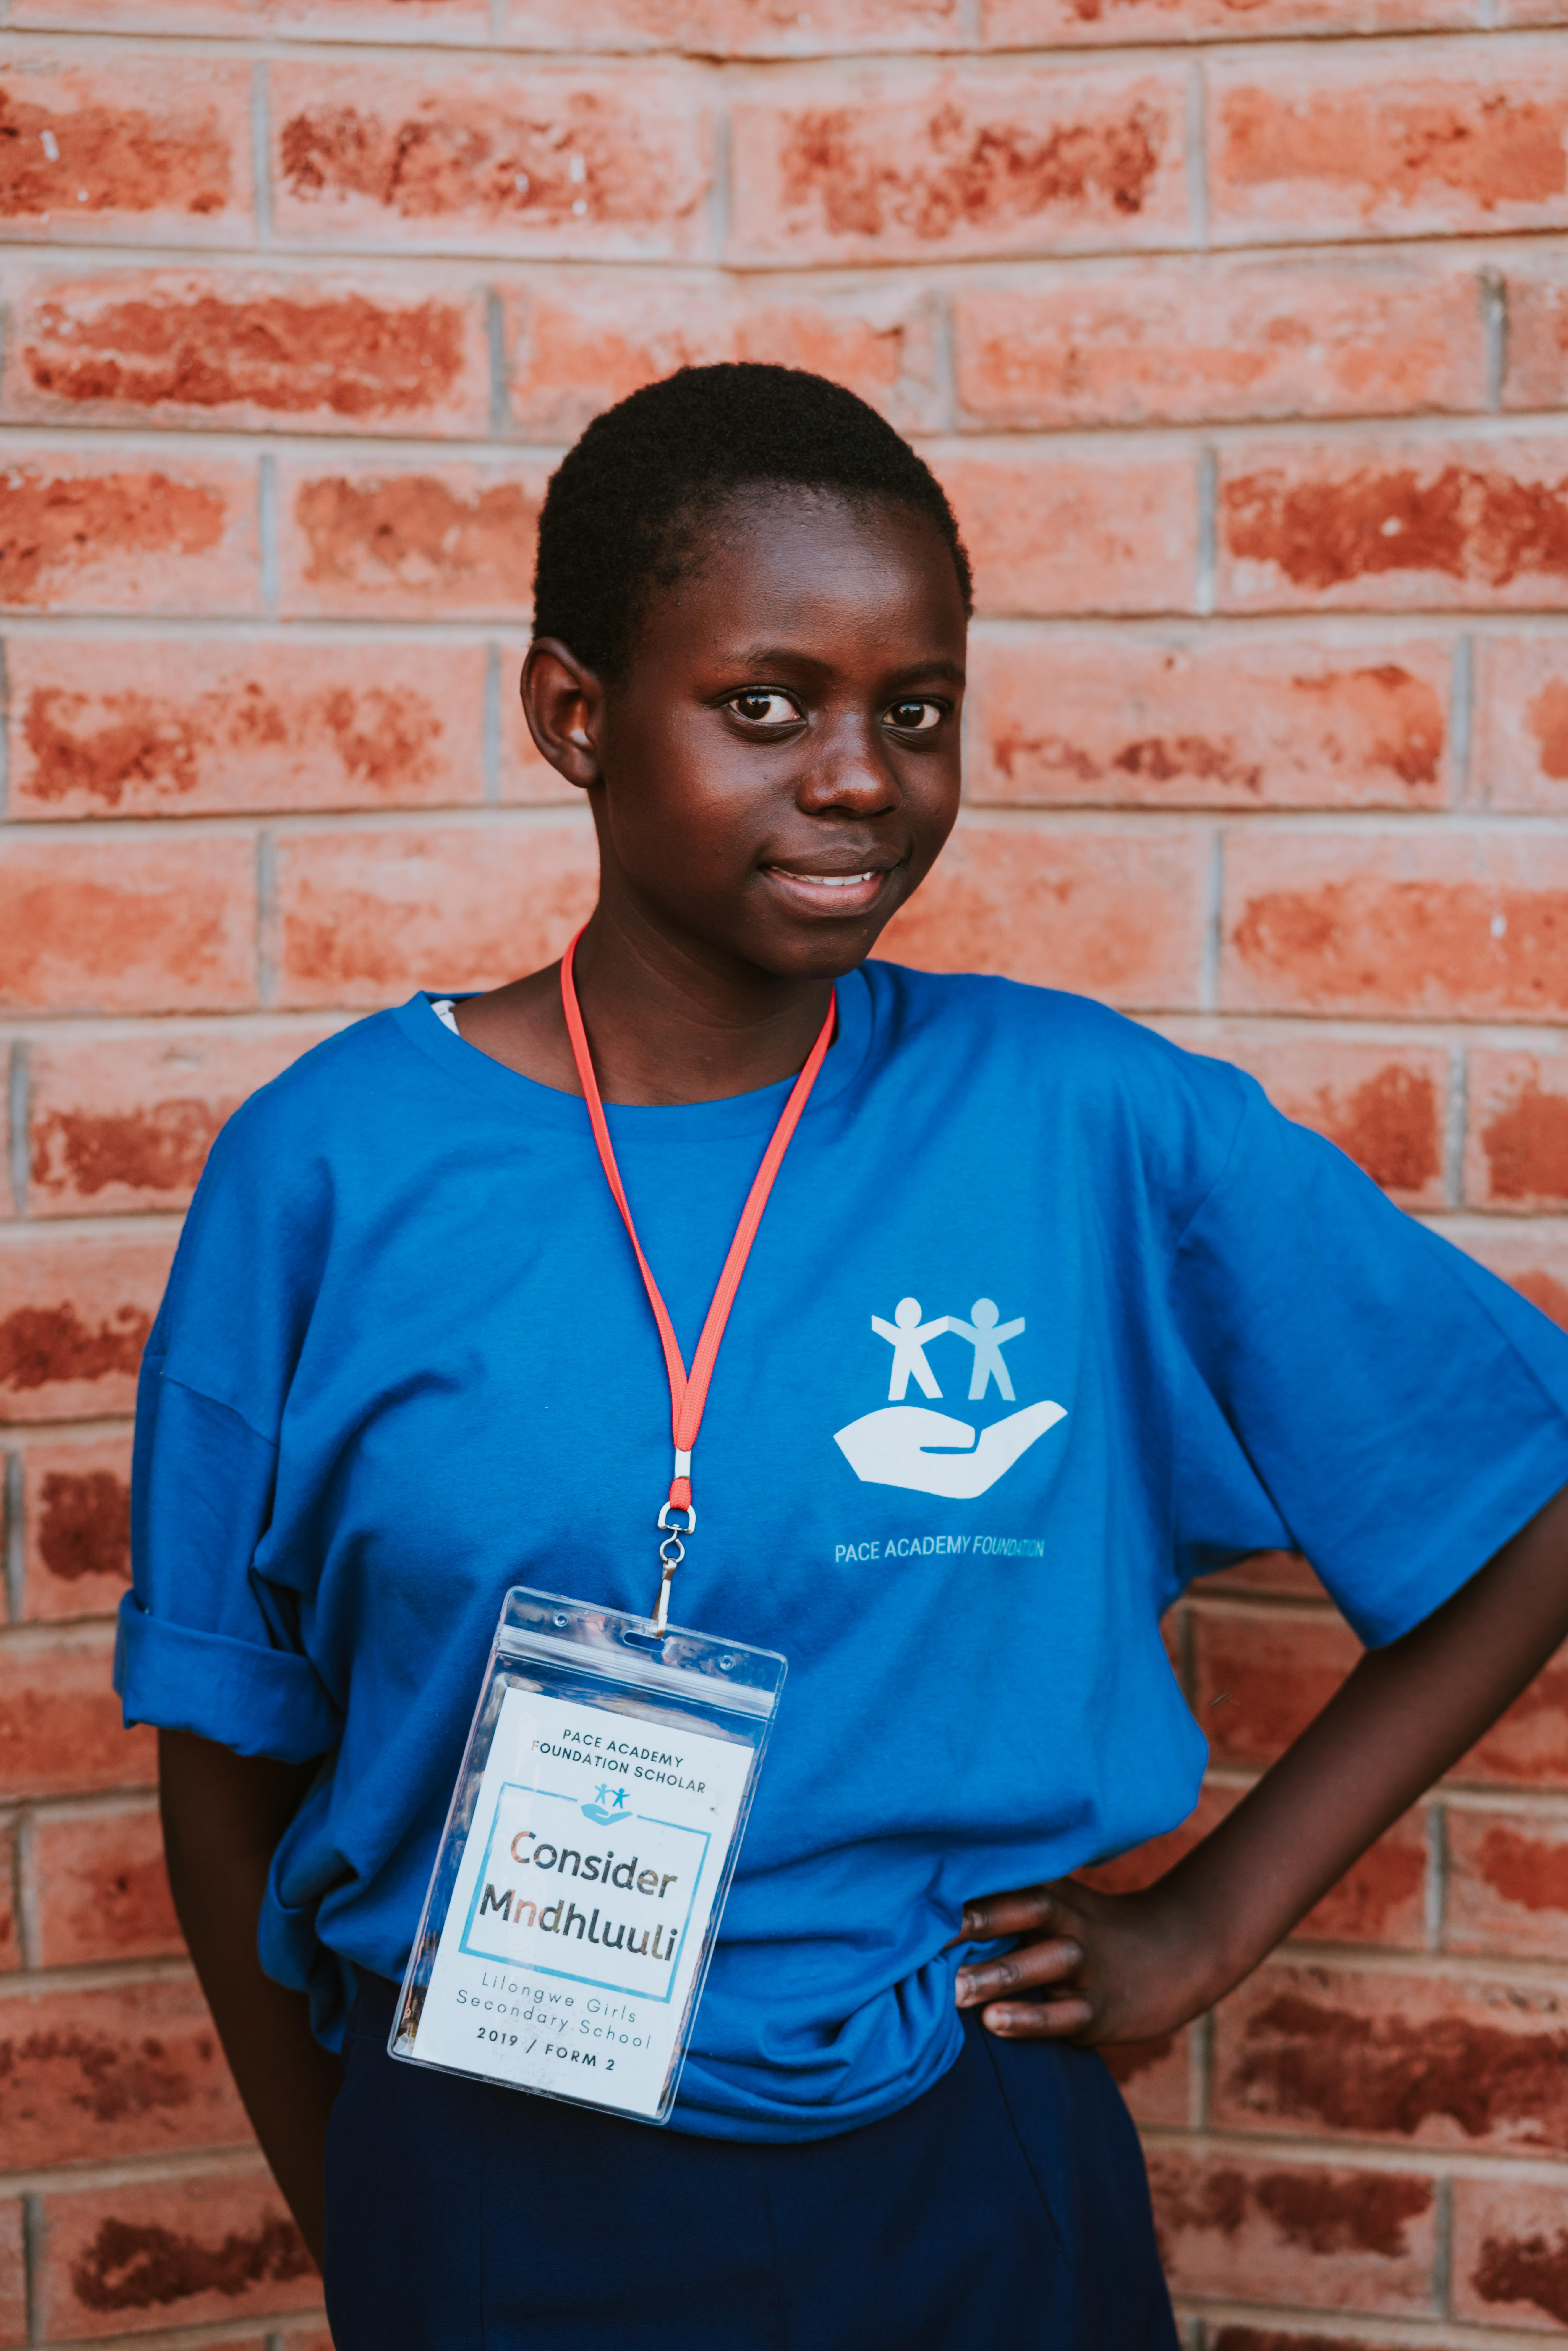 Consider Mndhluuli (Lilongwe Girls Secon